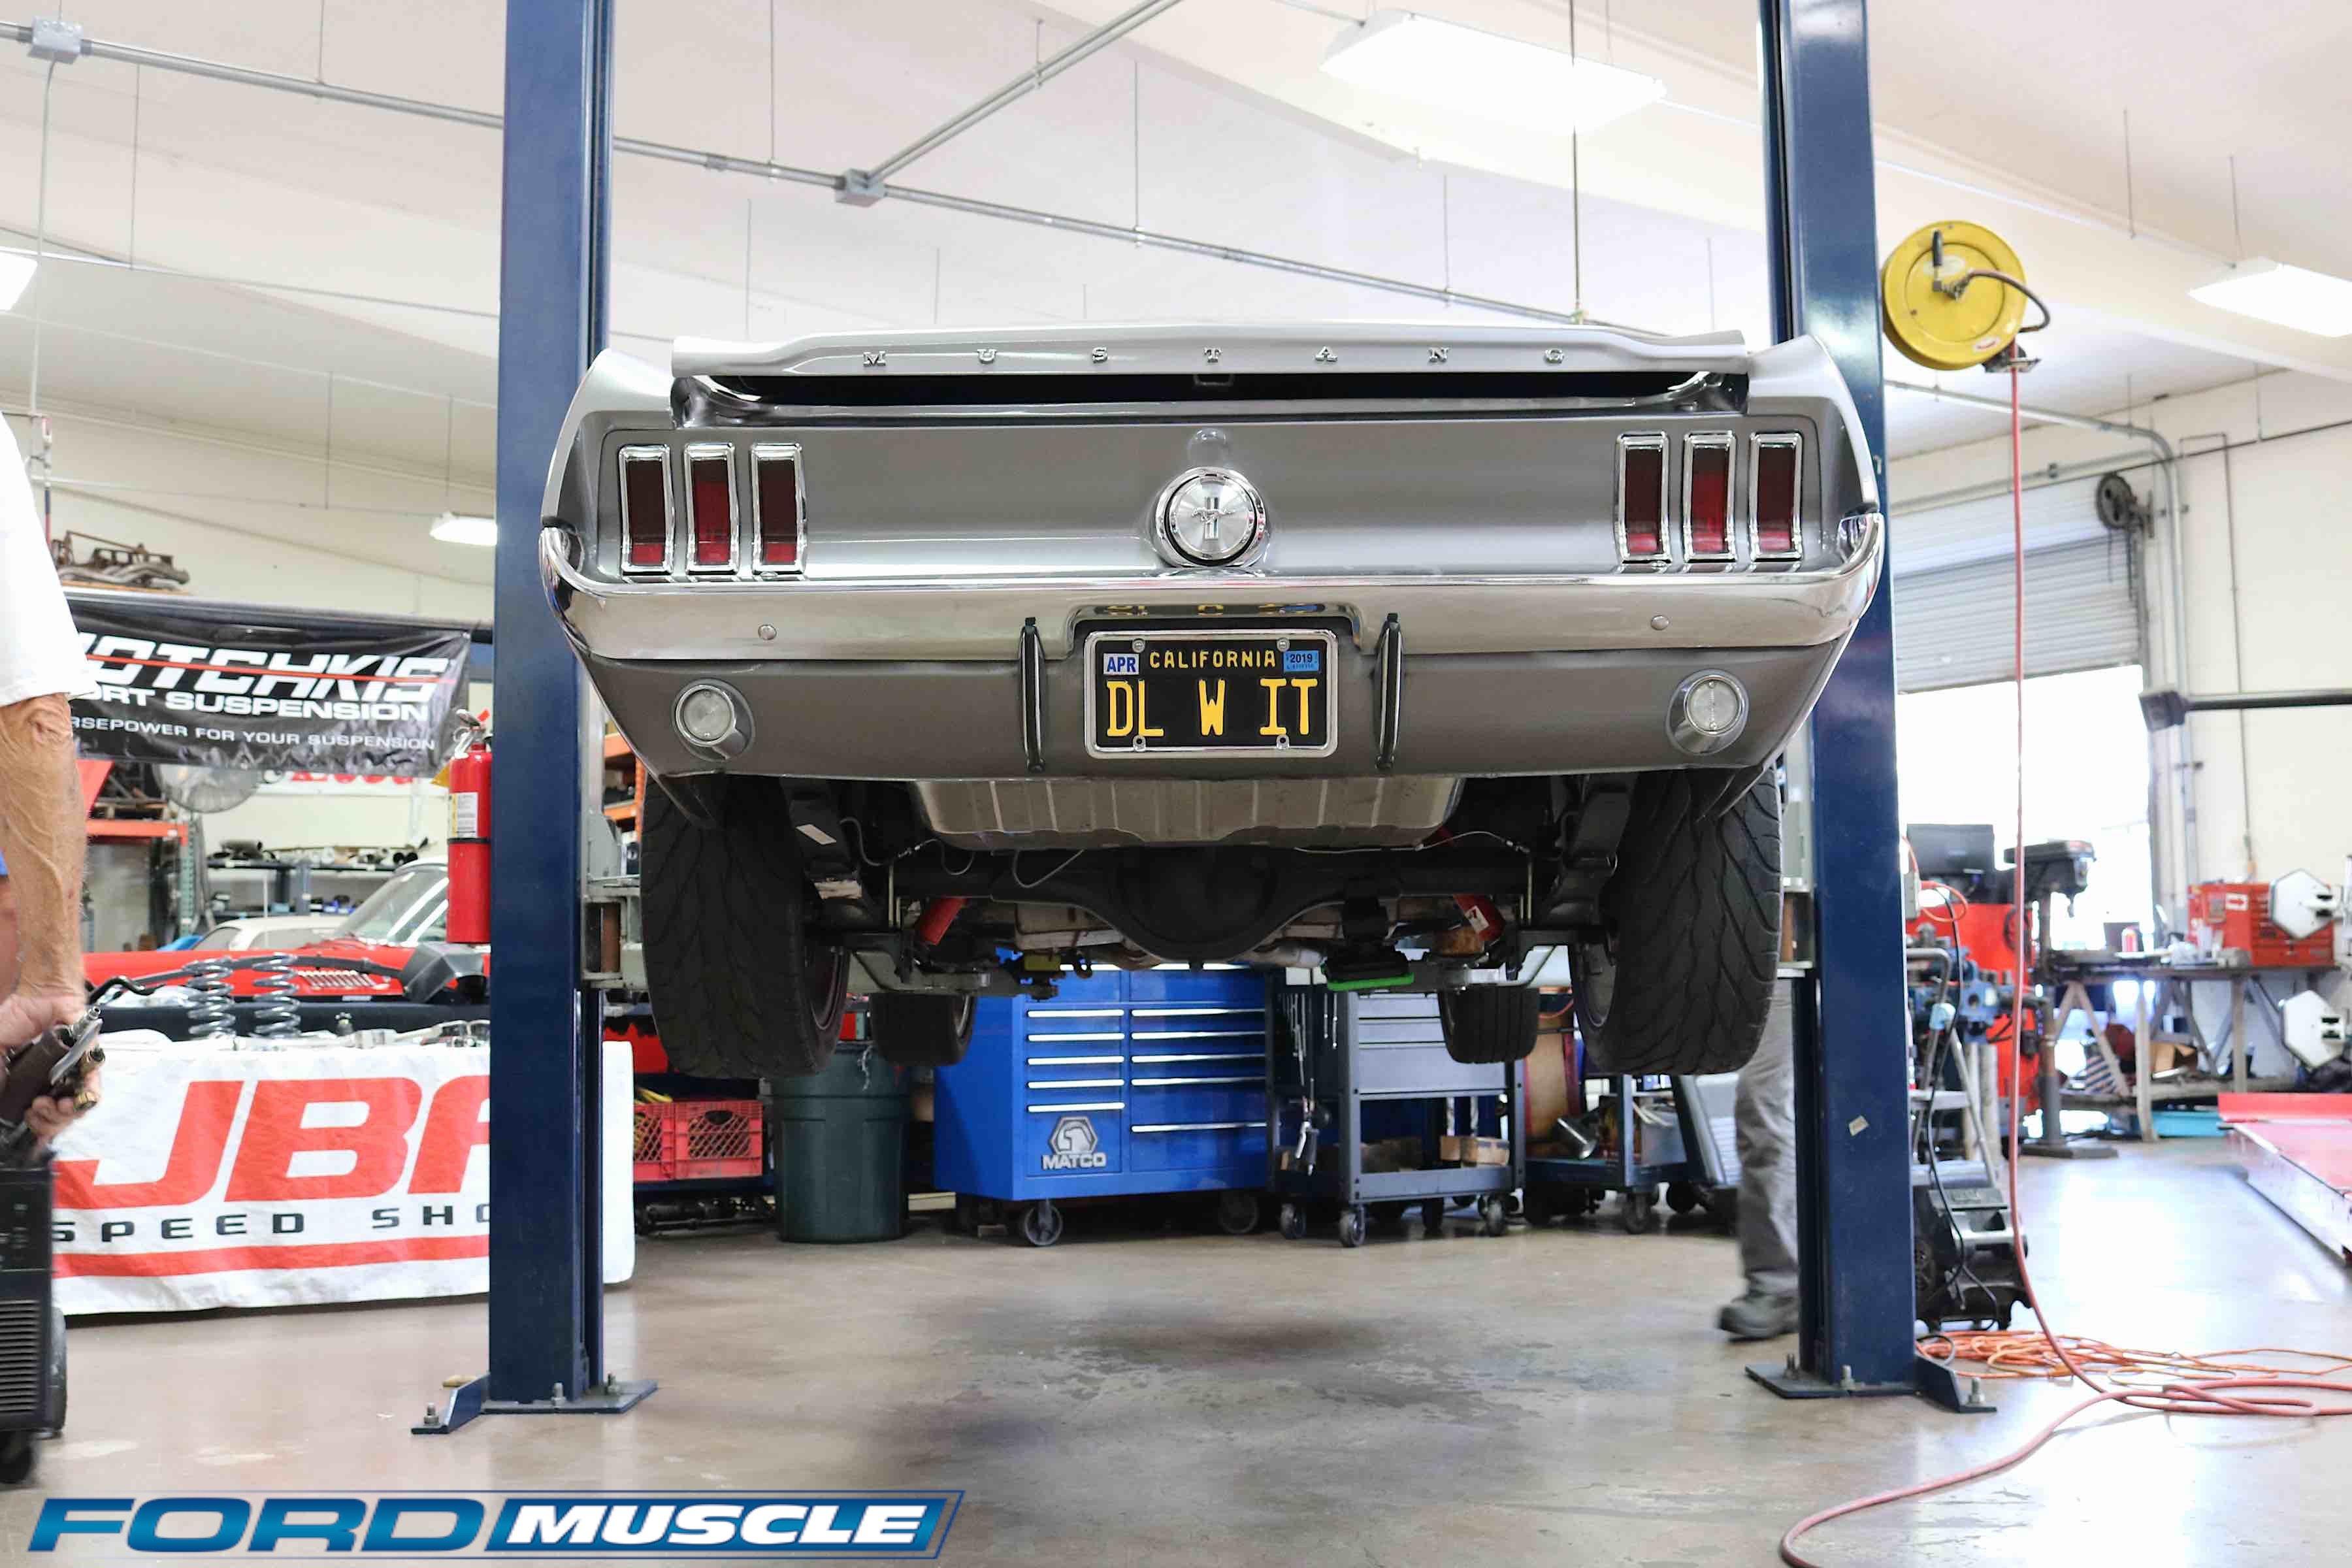 Suspension Upgrade Transforms A Classic Mustang Into A Corner Carver